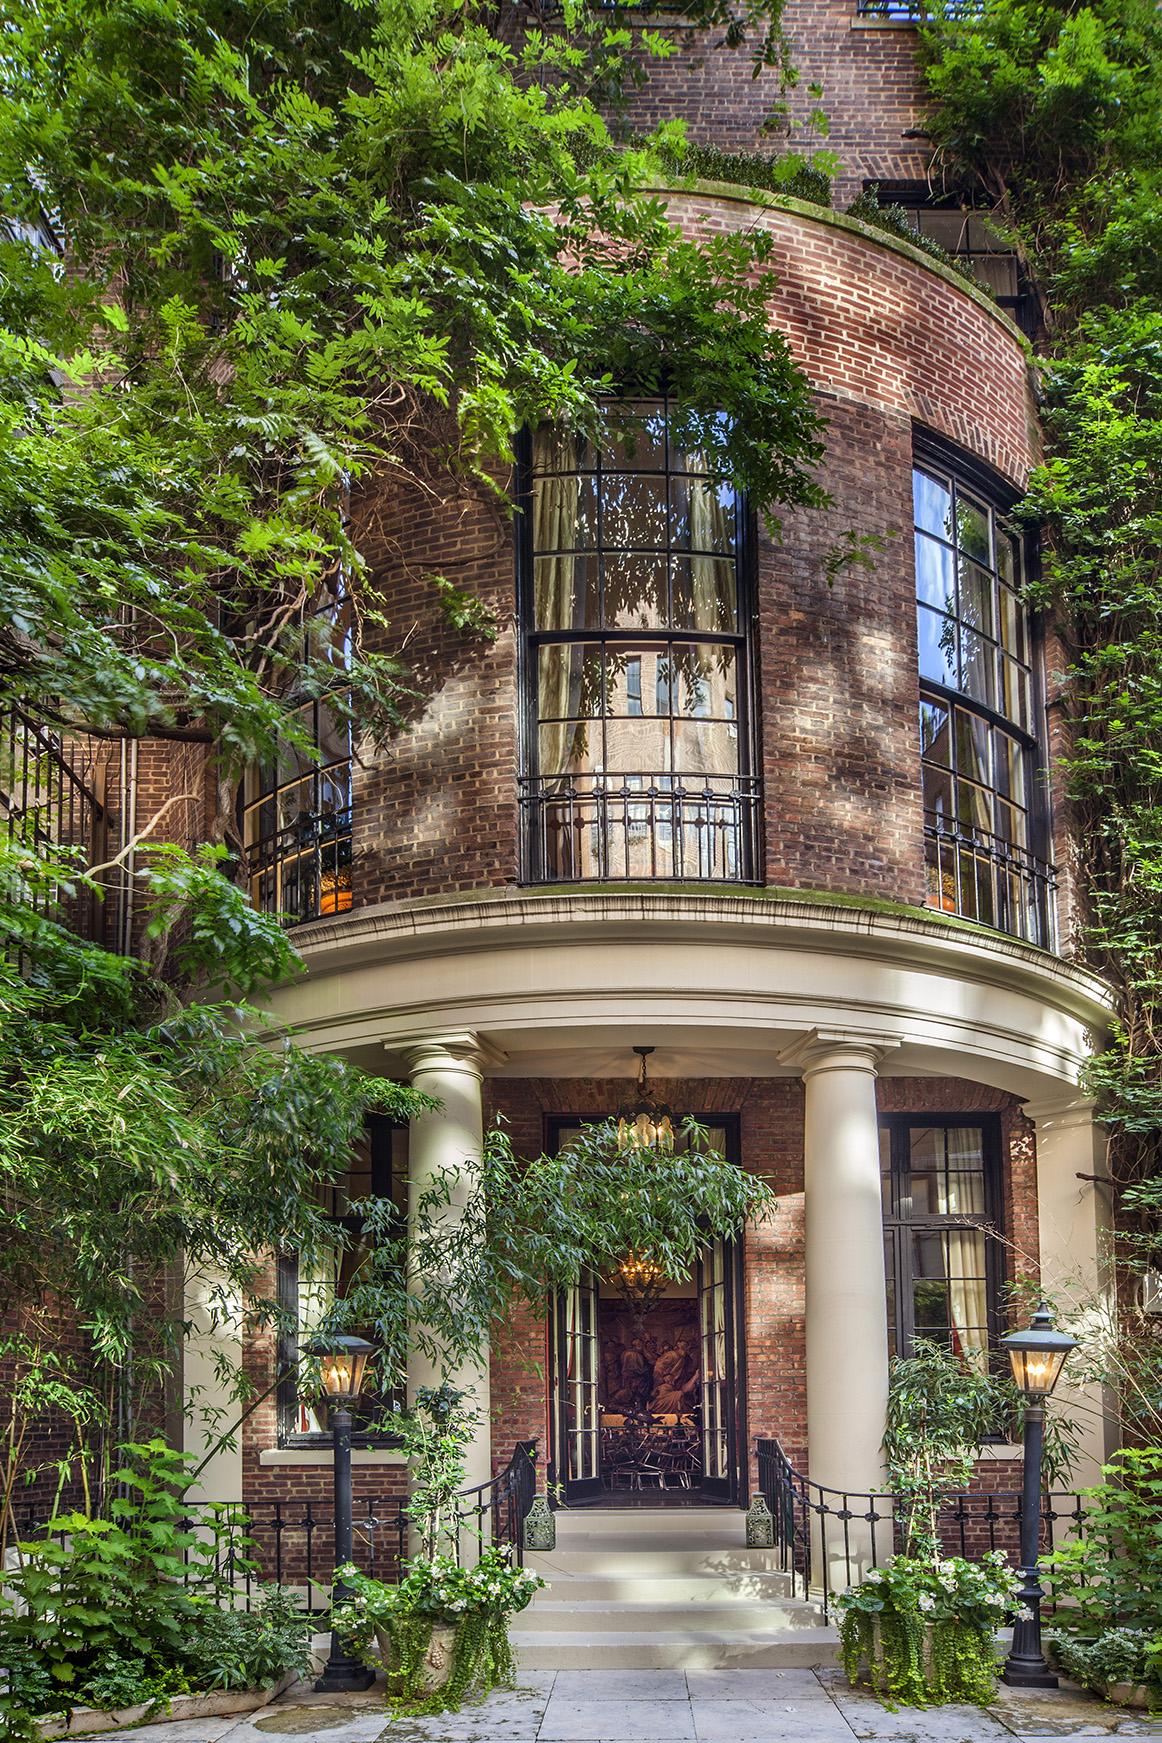 15 East 88th Street Carnegie Hill New York NY 10128